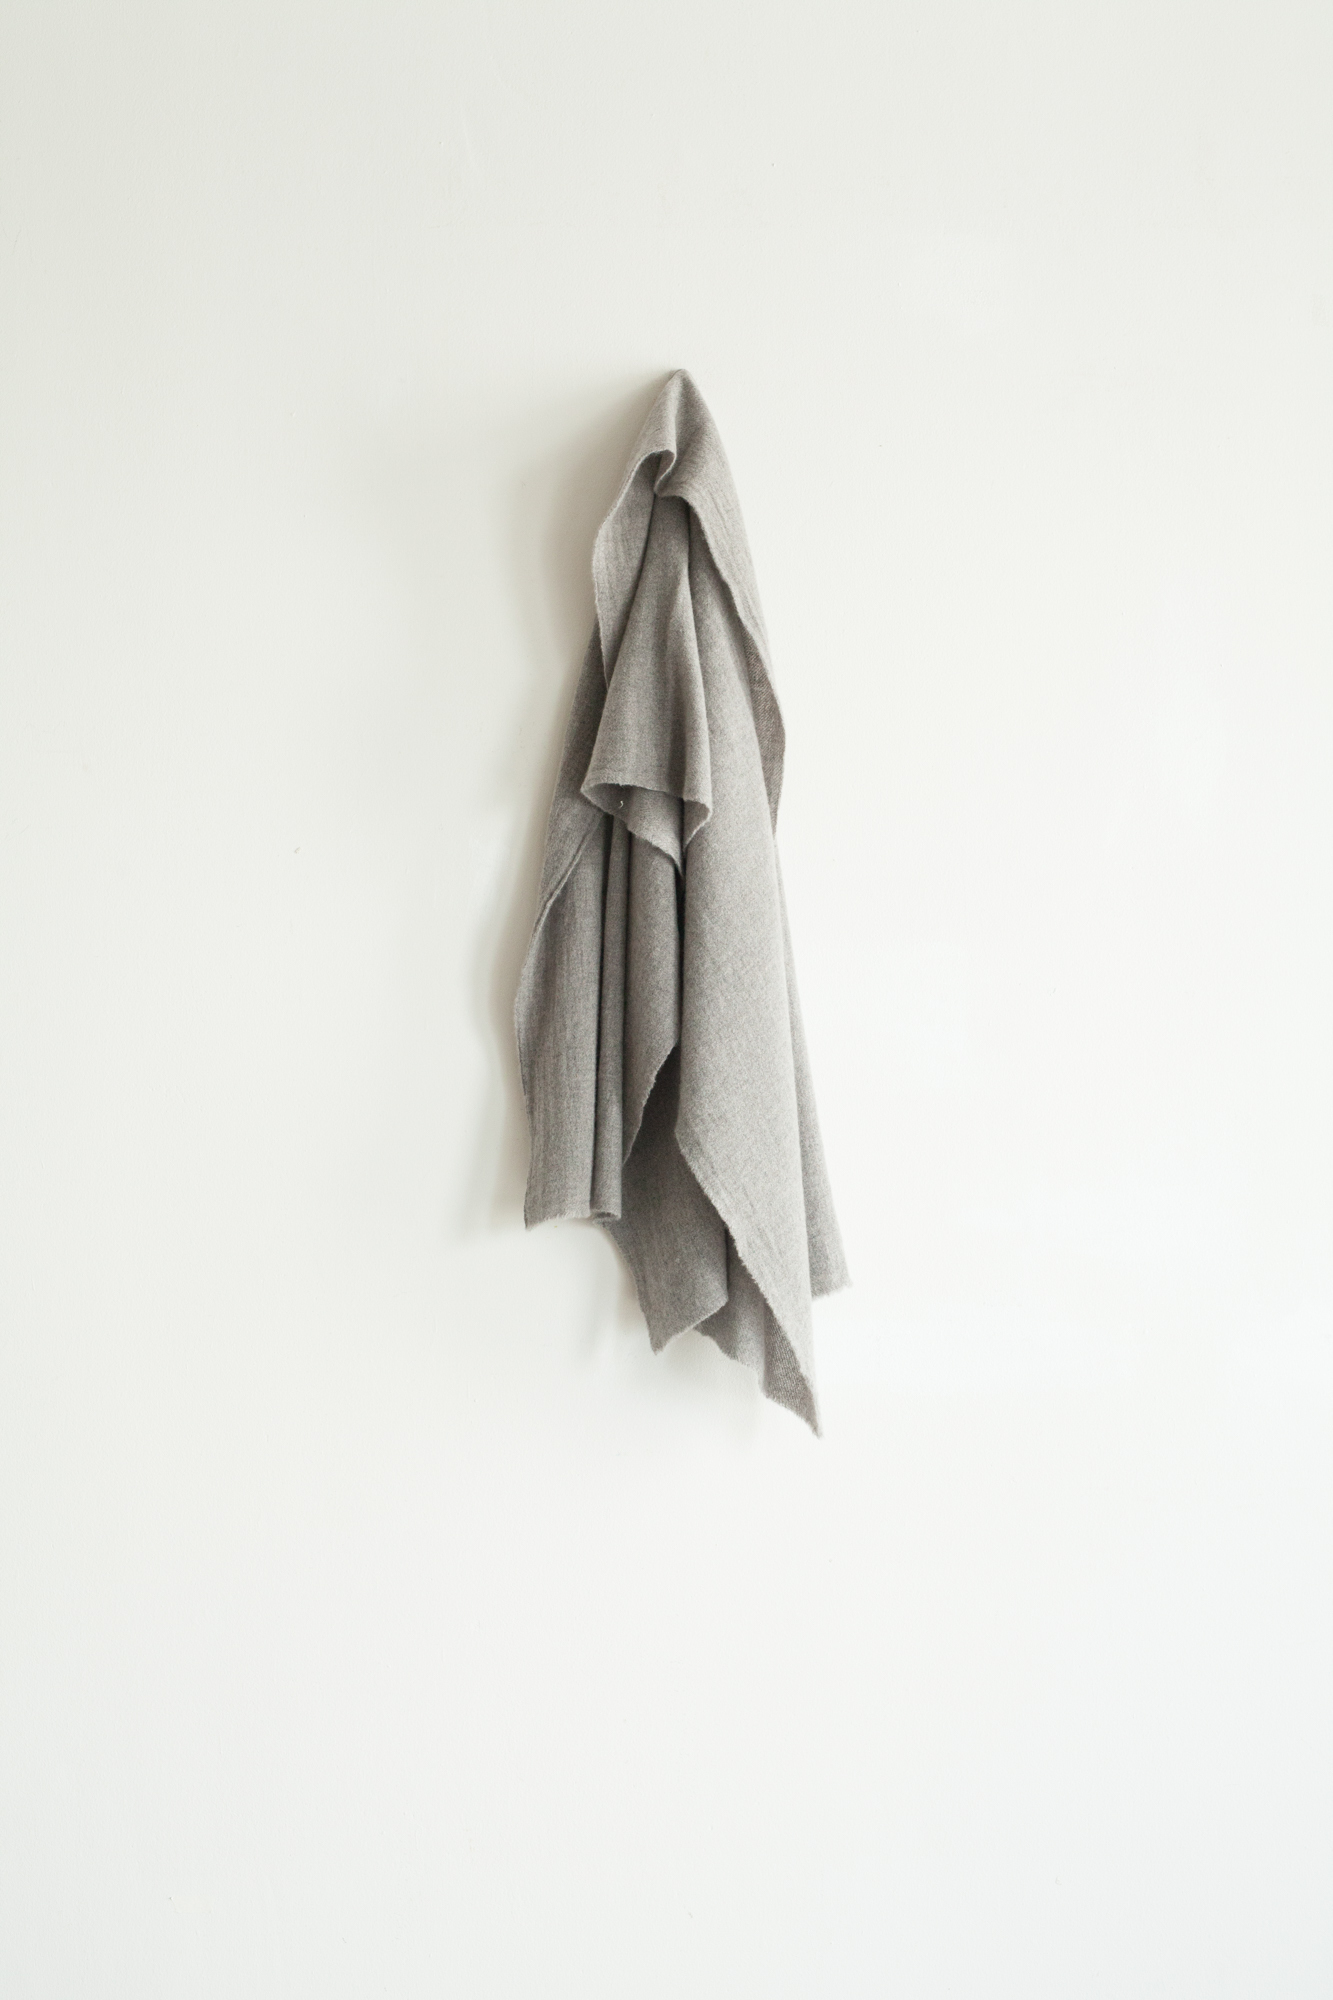 01492-2 cashmere short muffler / gray